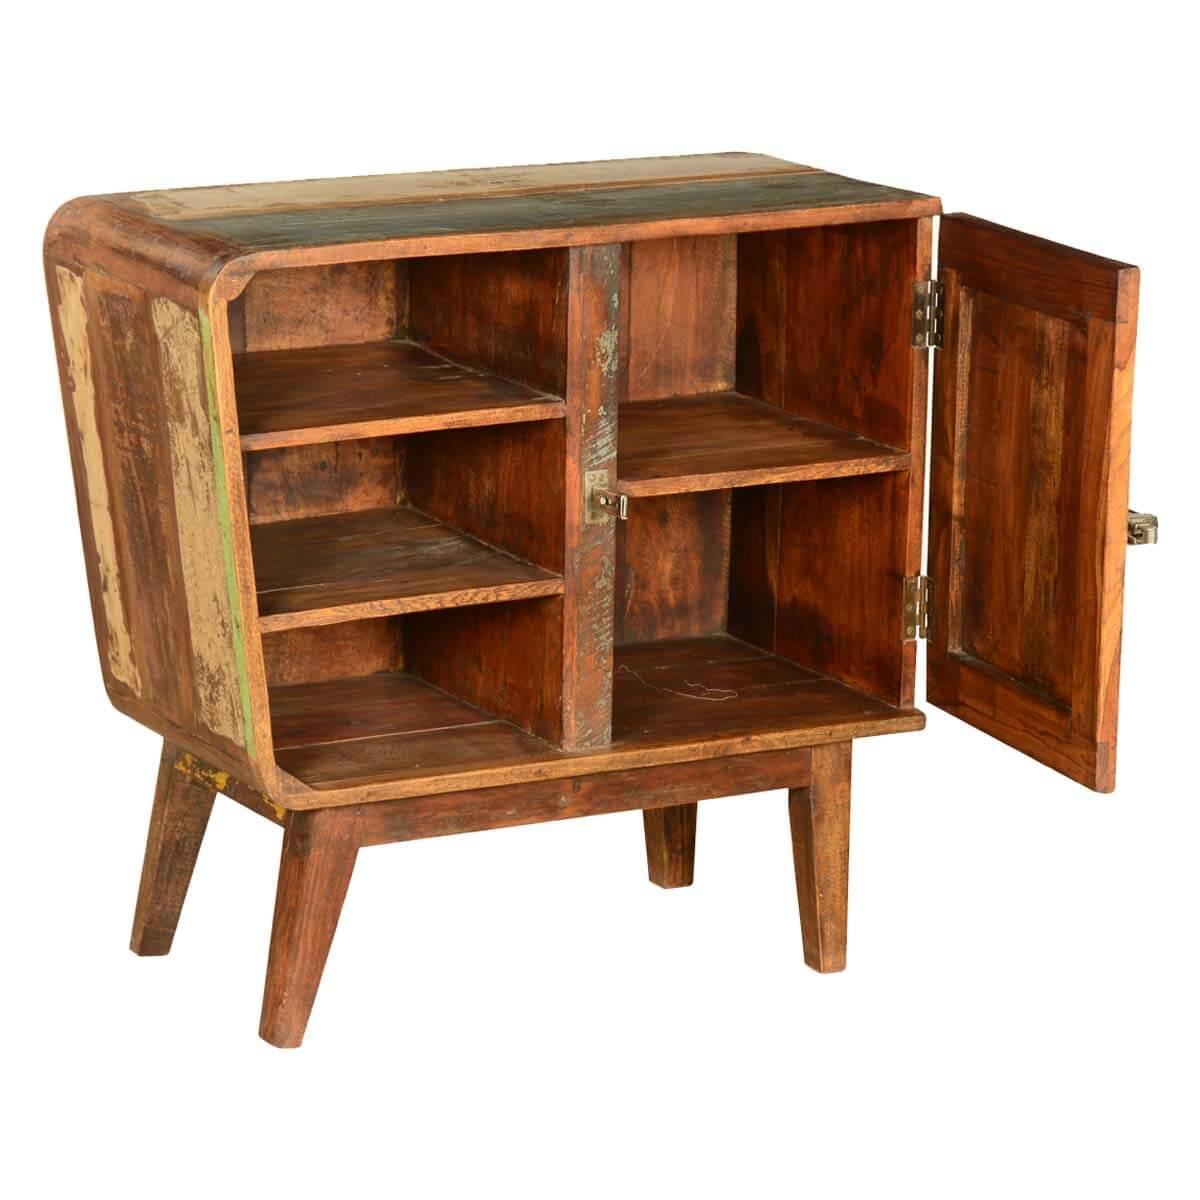 Destin Rustic Reclaimed Wood Open Shelf Freestanding Cabinet